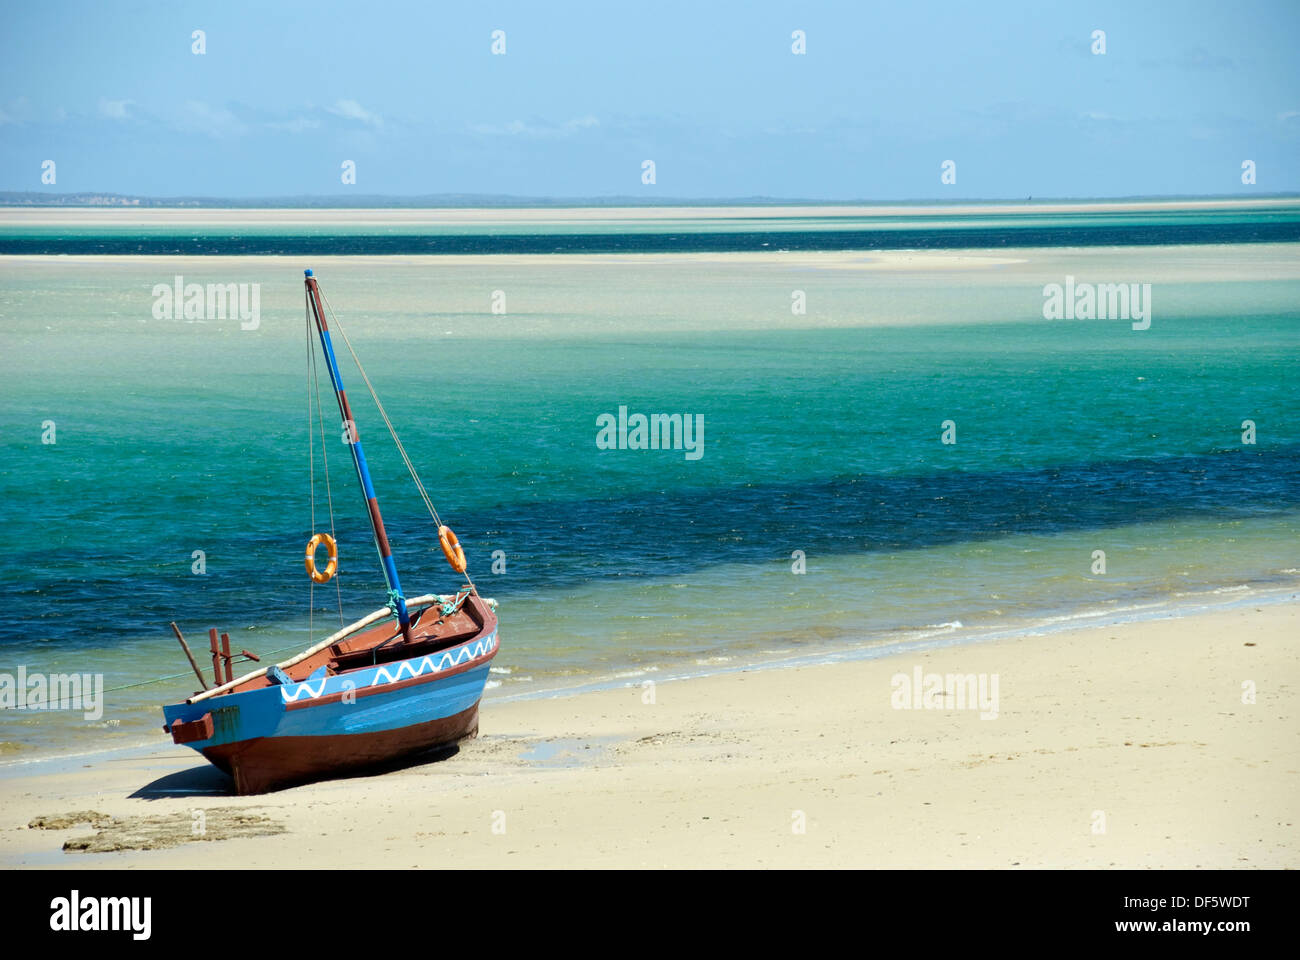 En Dhow al borde del agua, en Mozambique. Paisaje Imagen De Stock